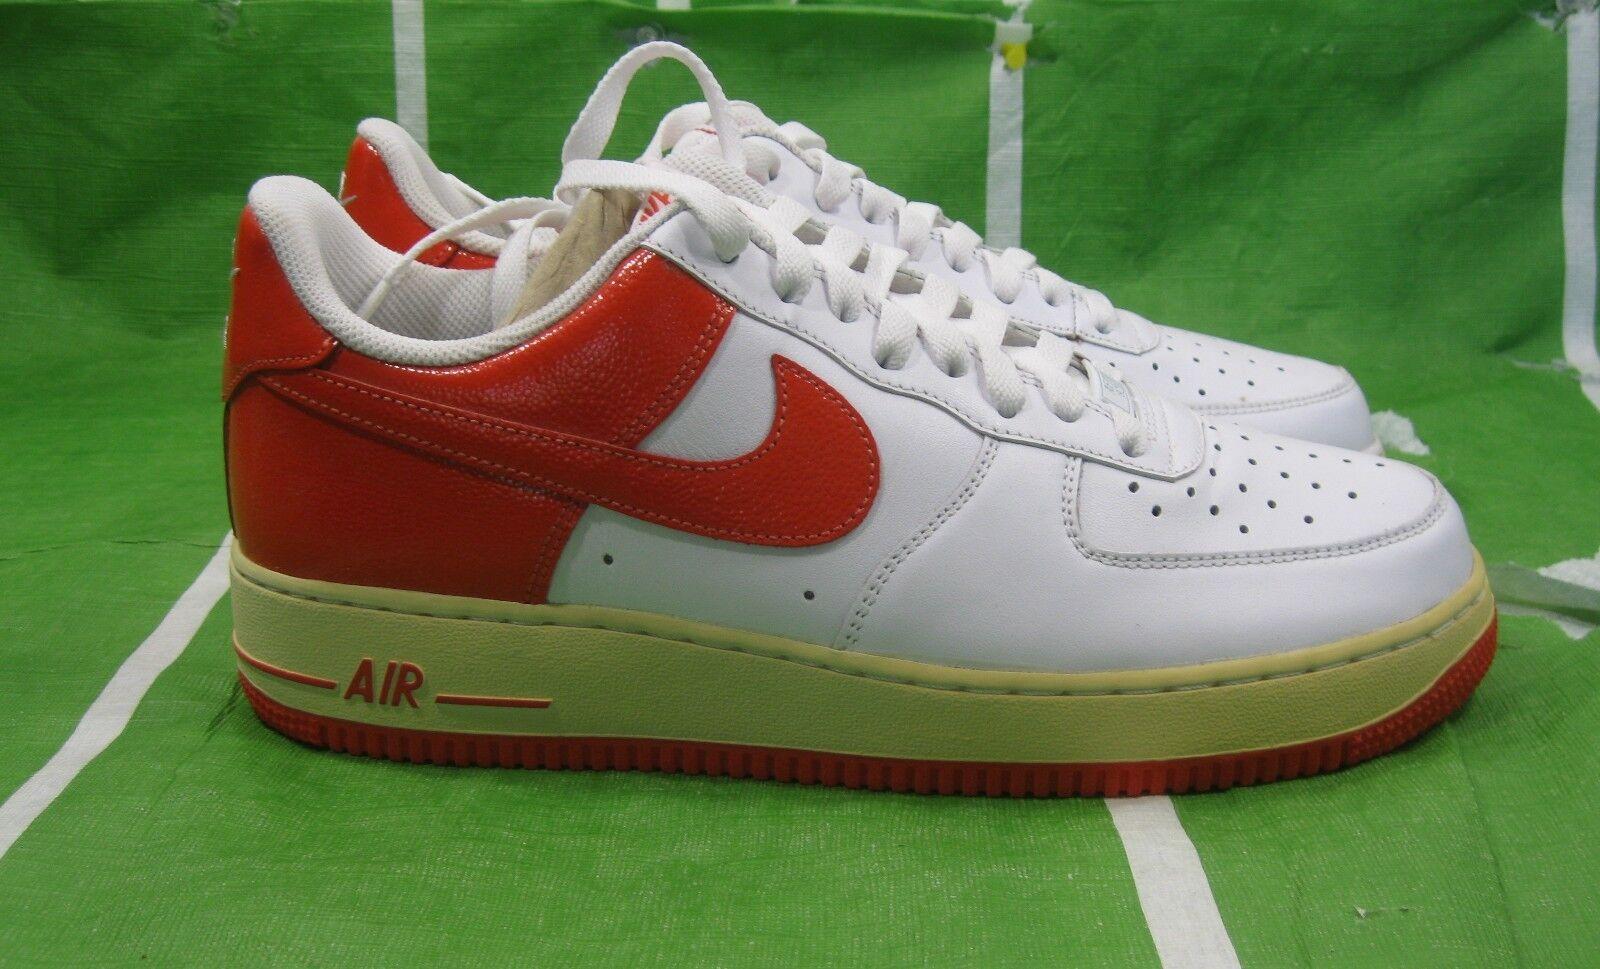 Nike Hommes Air Force blanc Orange Shoe - 315122-153 .blanc /Orange